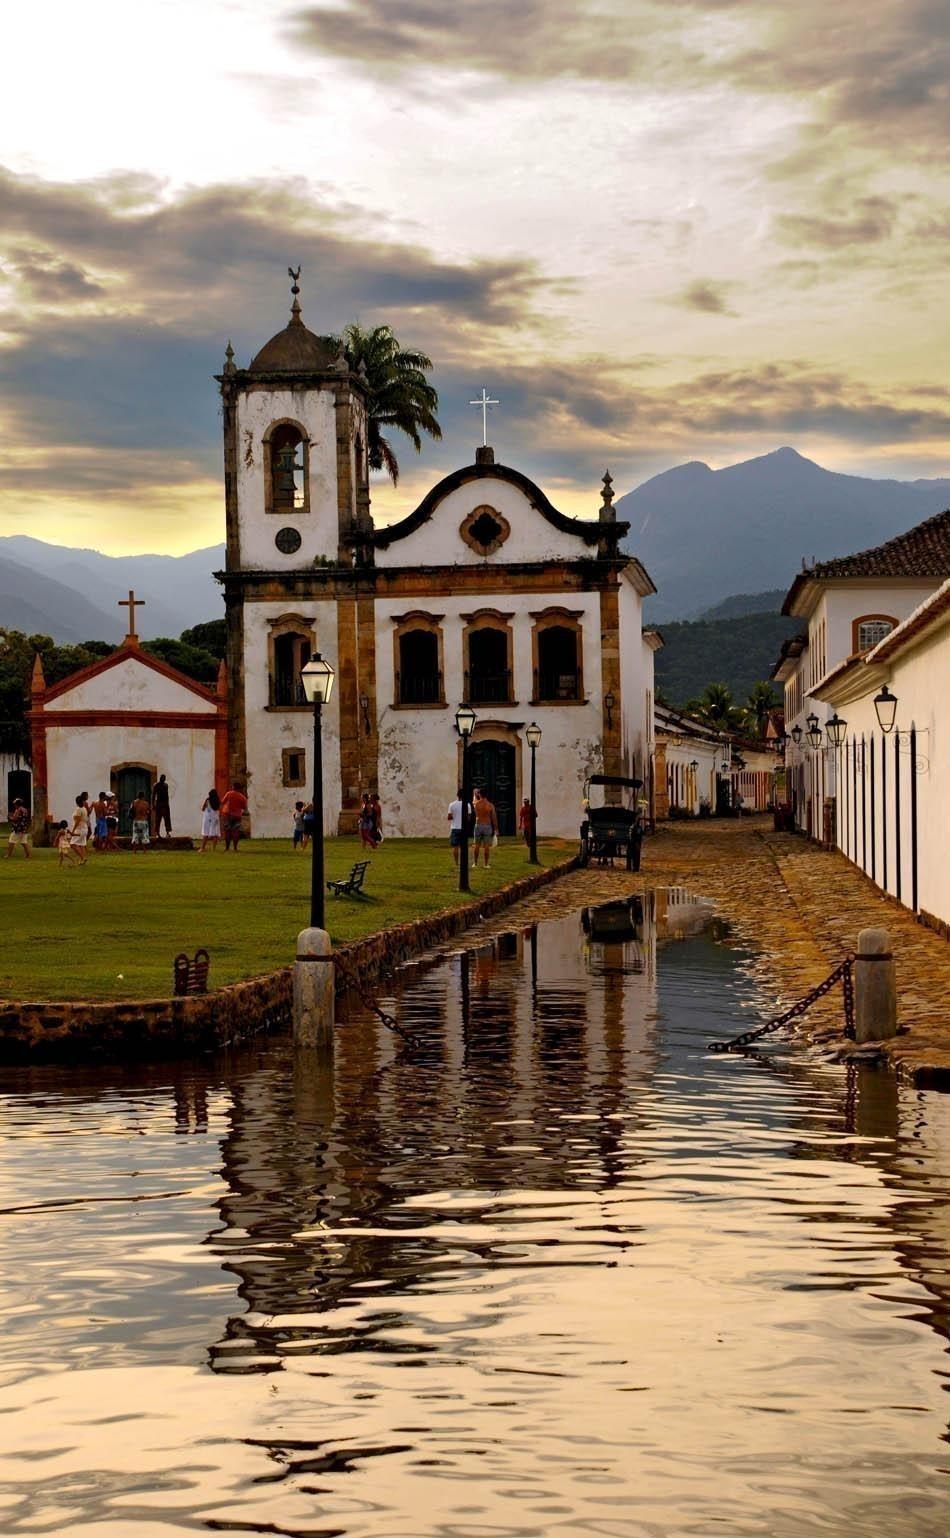 Capela de Santa Rita, Paraty, Rio de Janeiro | Brazil Travel Guide